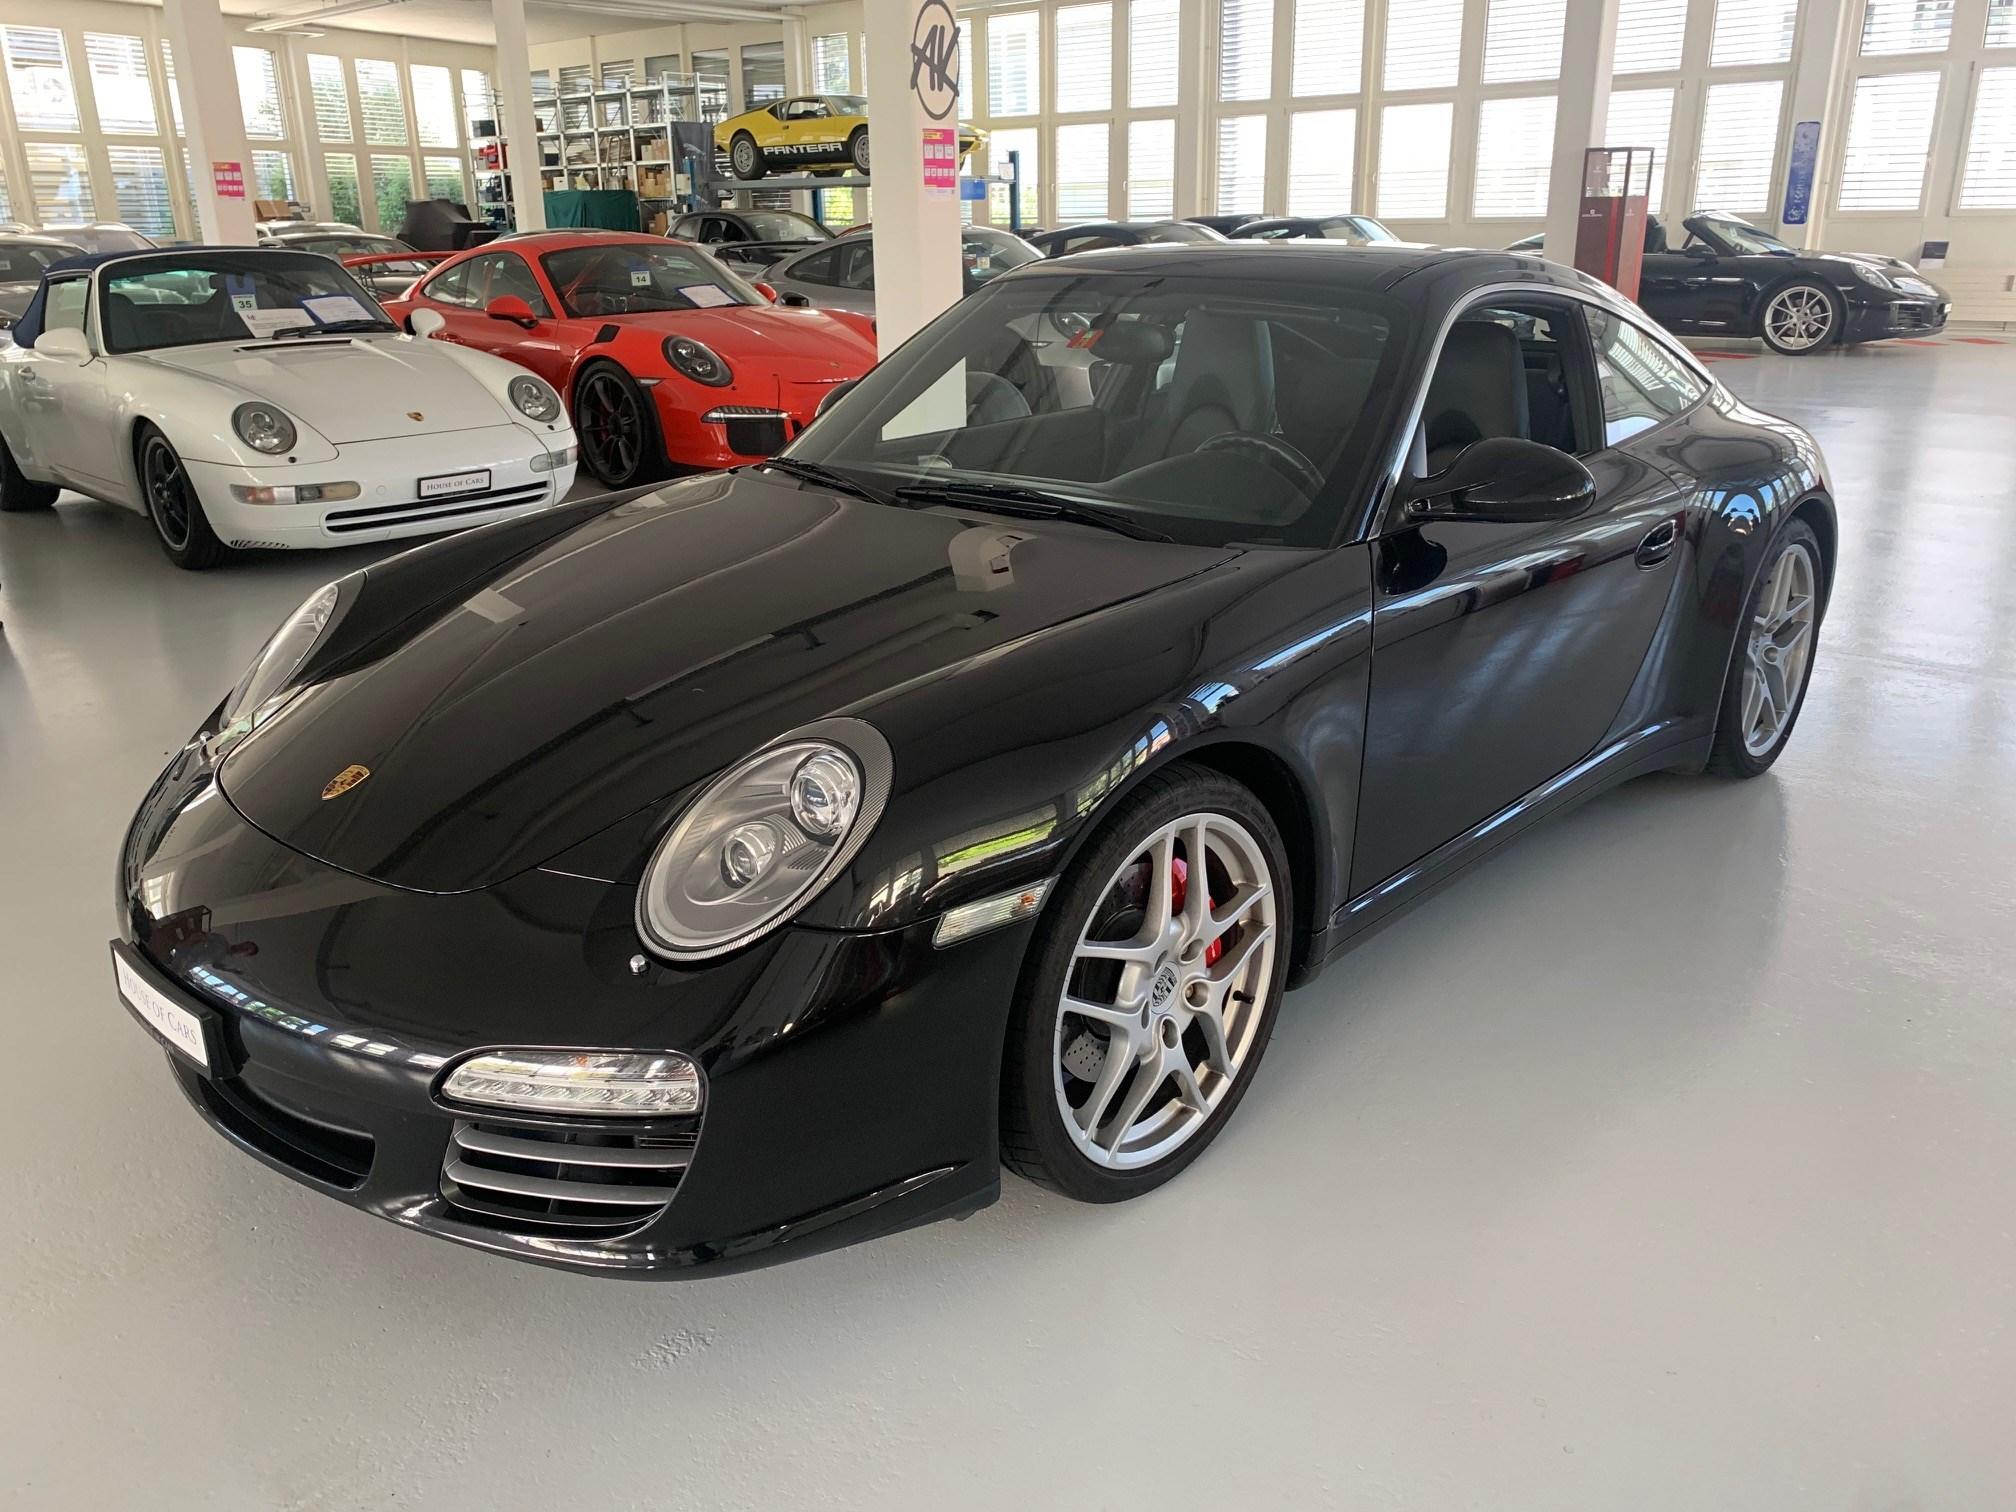 cabriolet Porsche 911 Targa 4S Manual (997 II)